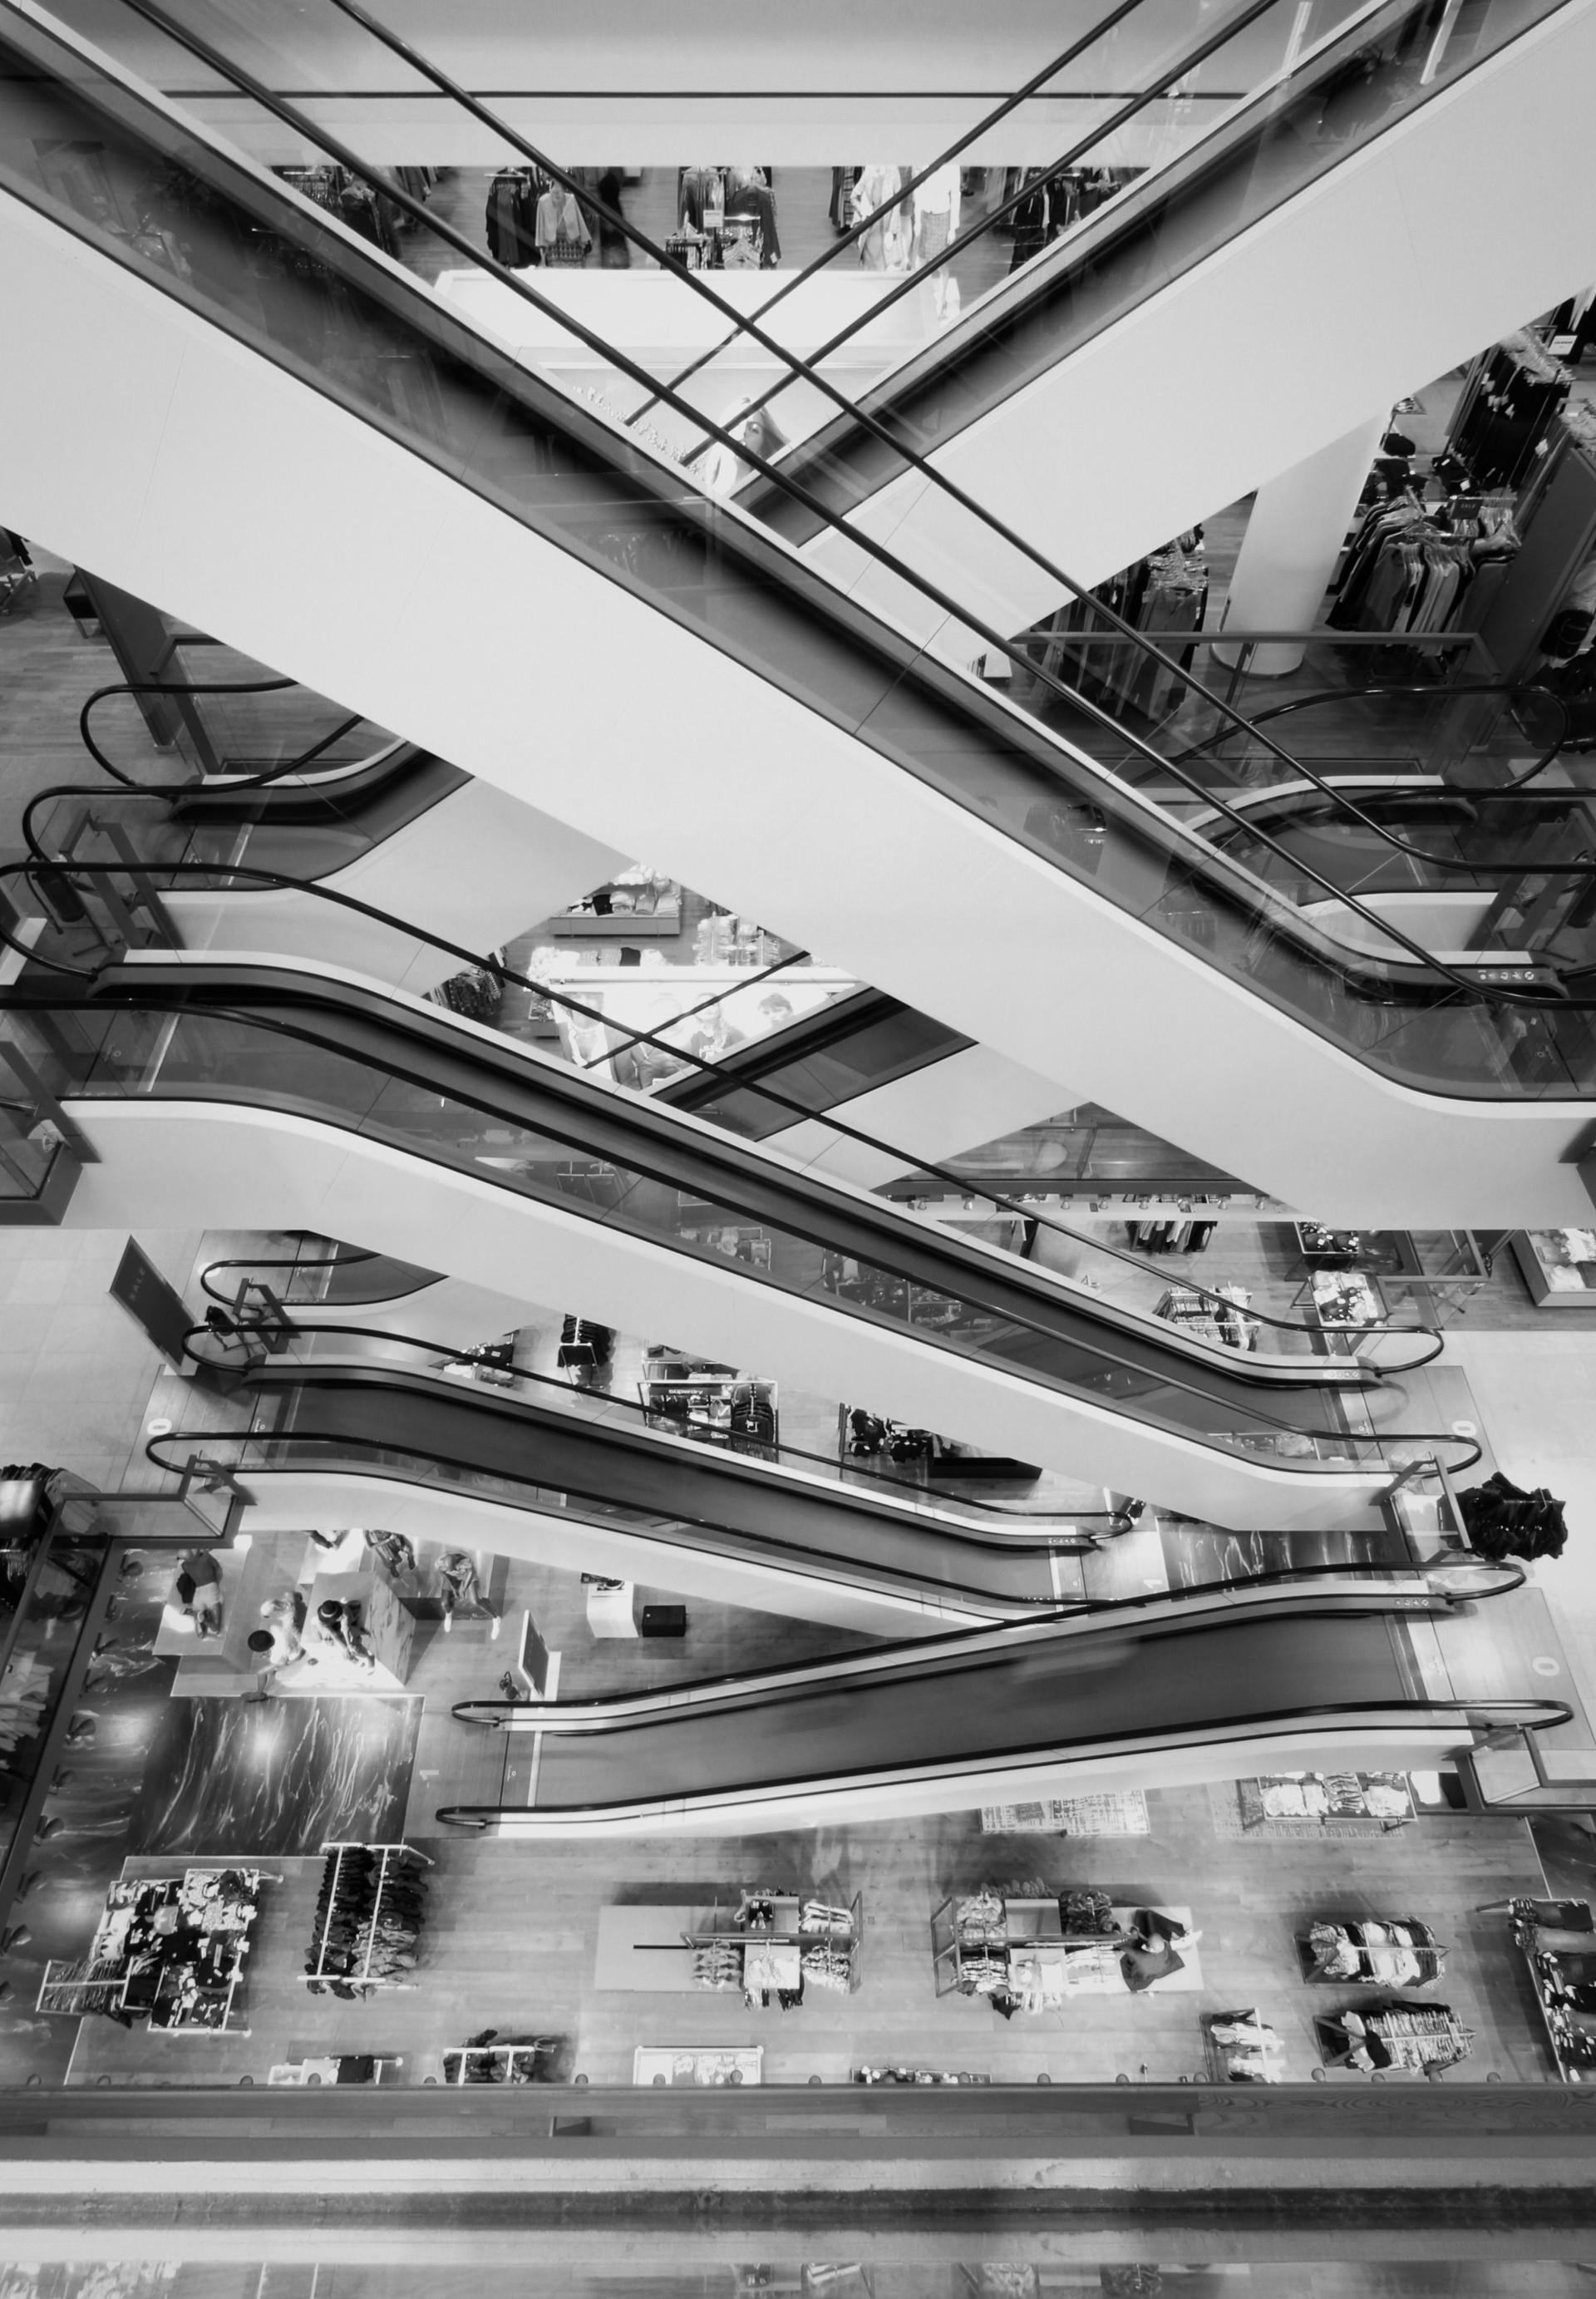 boehmarchitektur Peek & Cloppenburg, Wuppertal